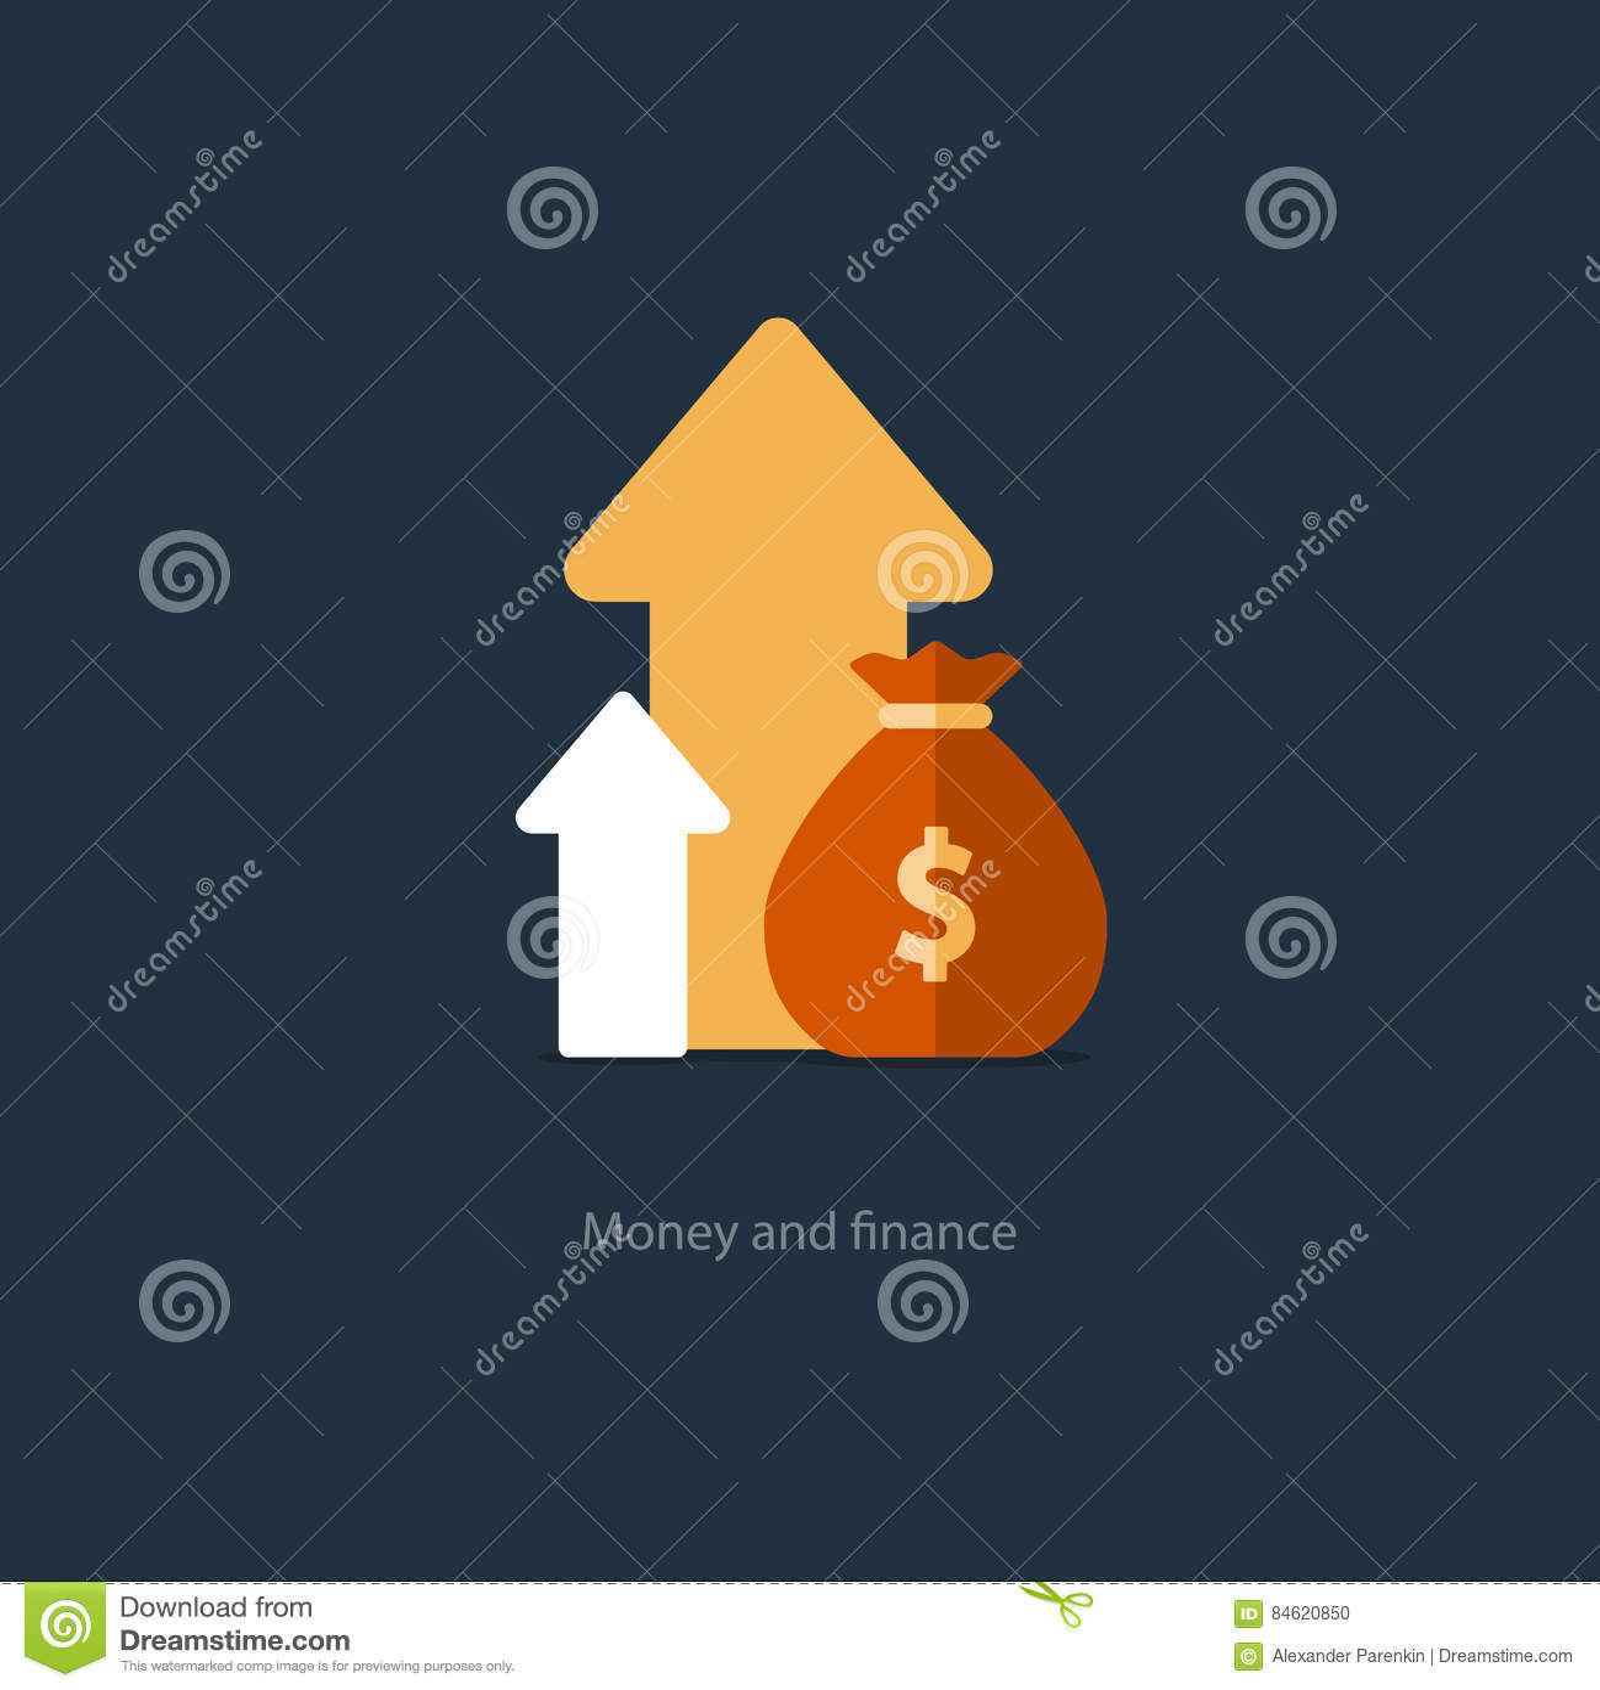 Financiën en investeringsbeheer, begroting planning, samengestelde interest, inkomen